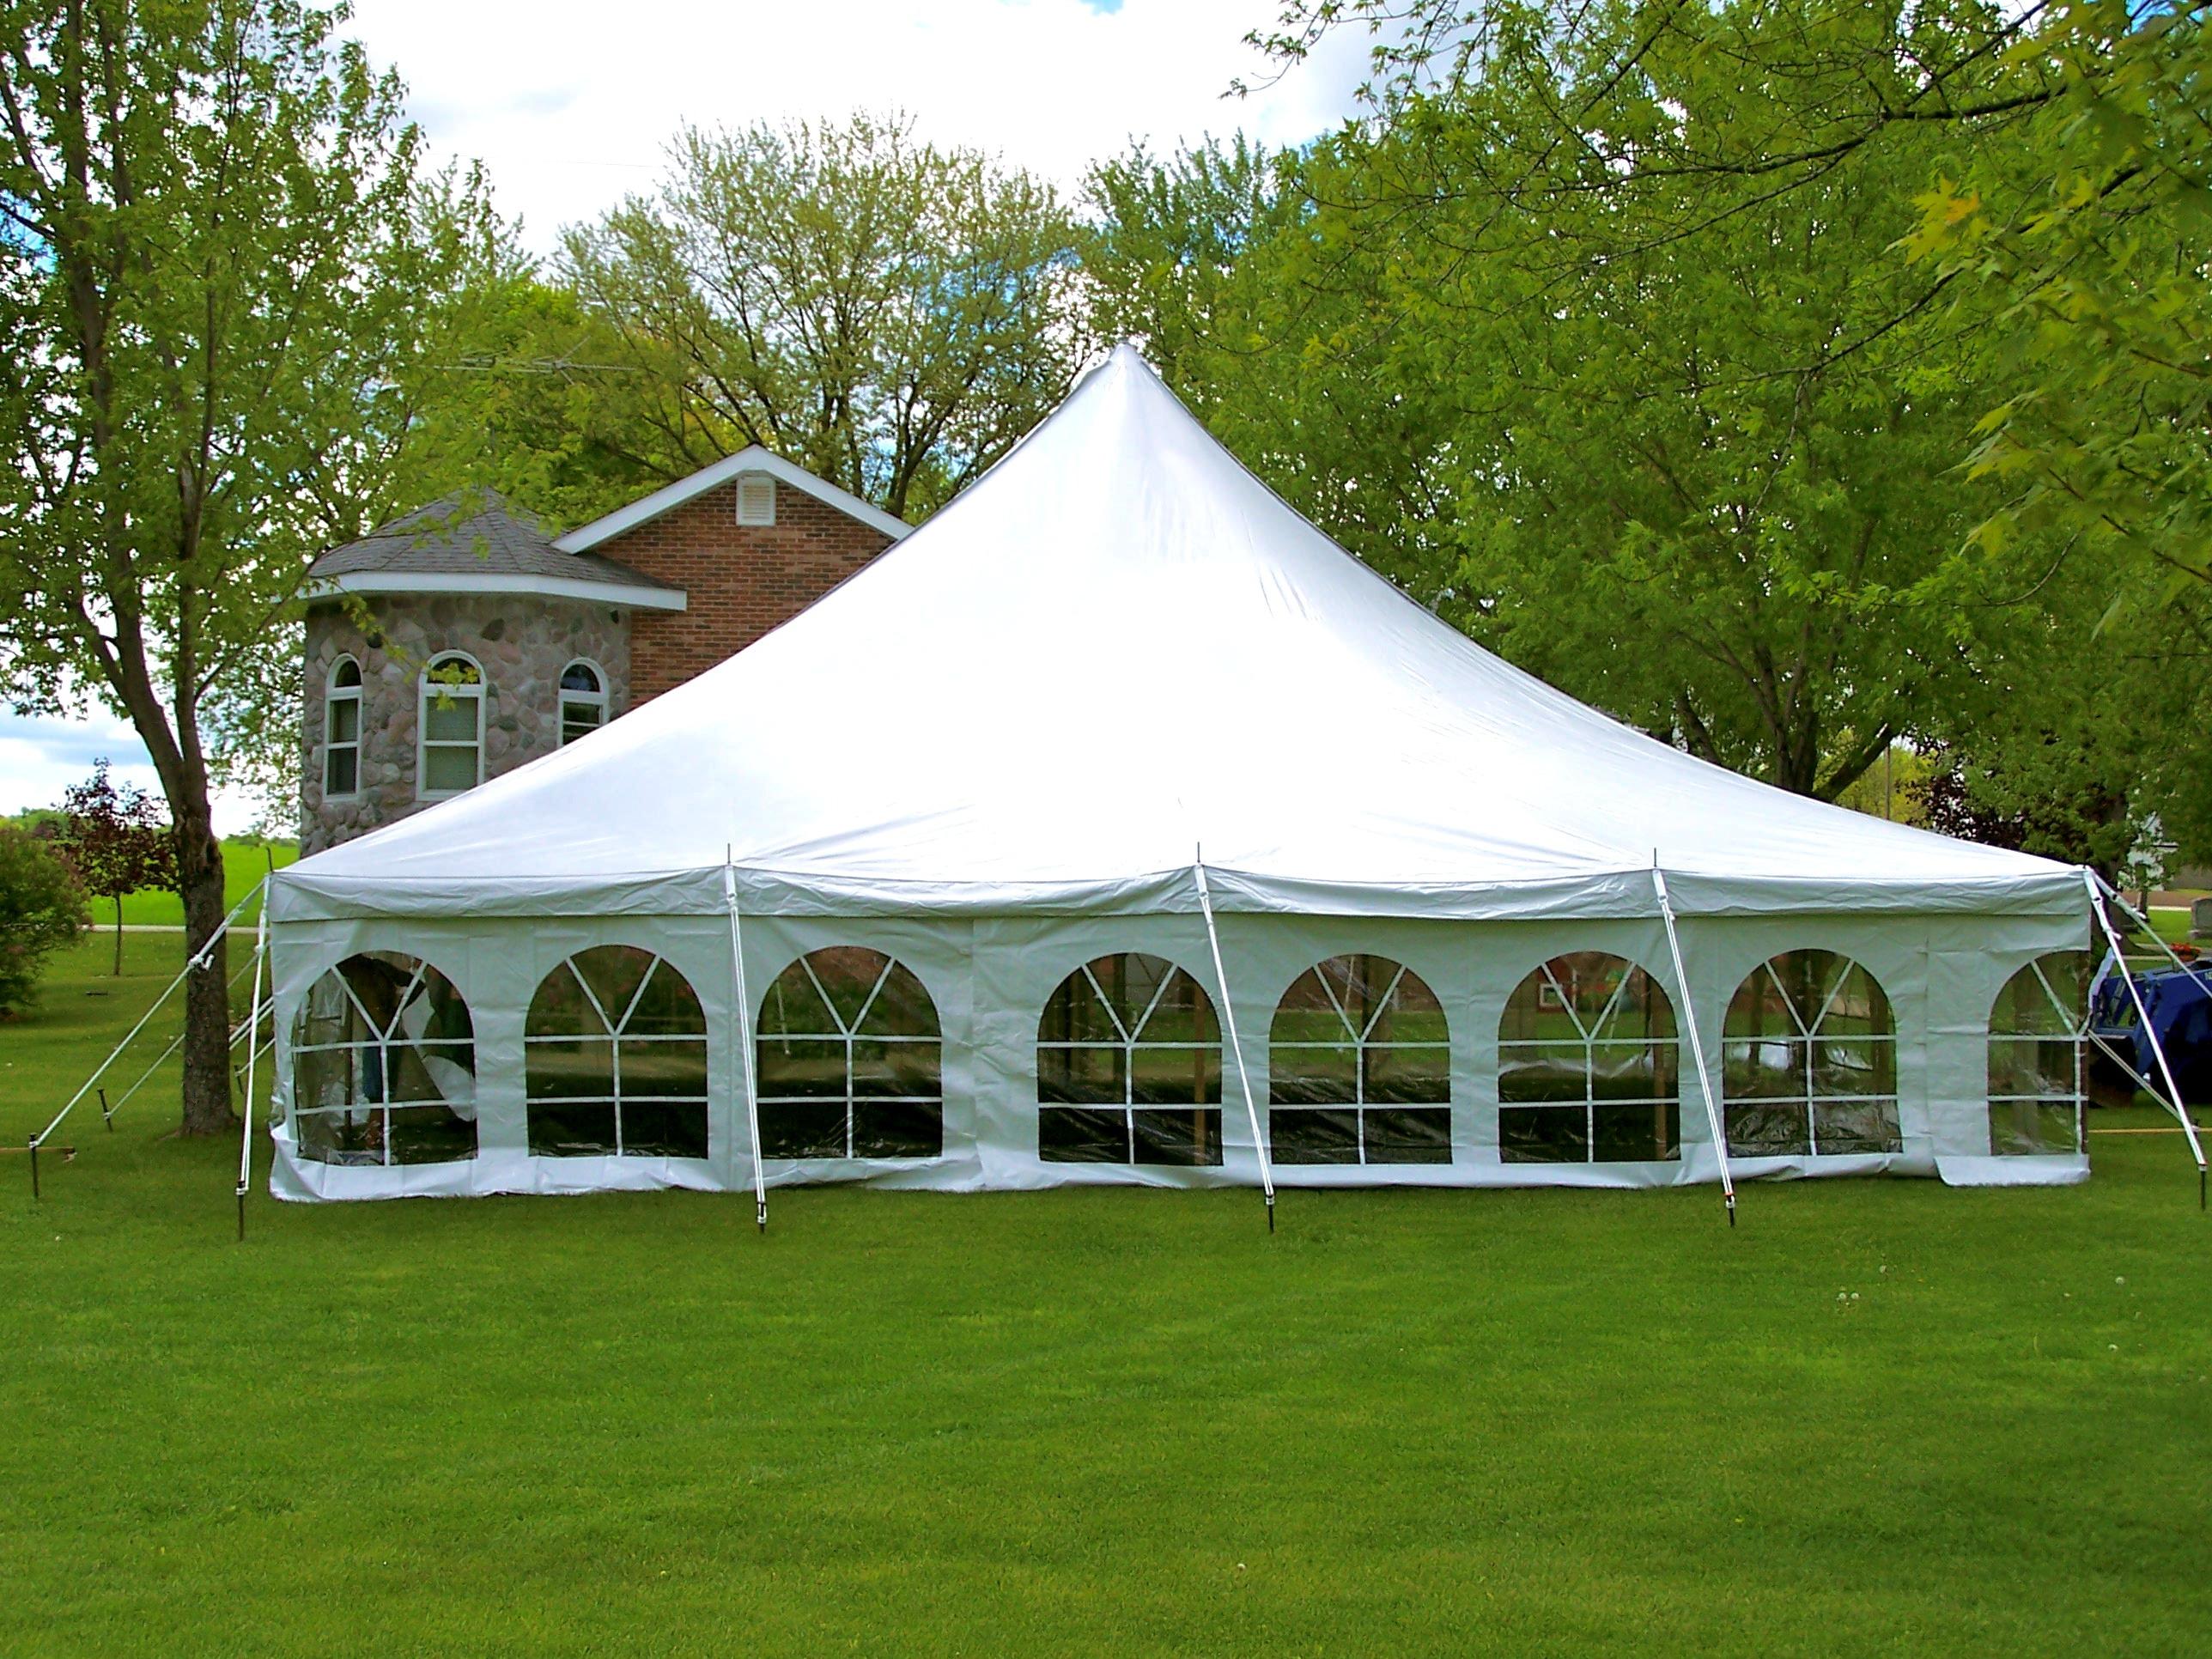 40 x 40 Pole Tent & 40 x 40 Pole Tent |